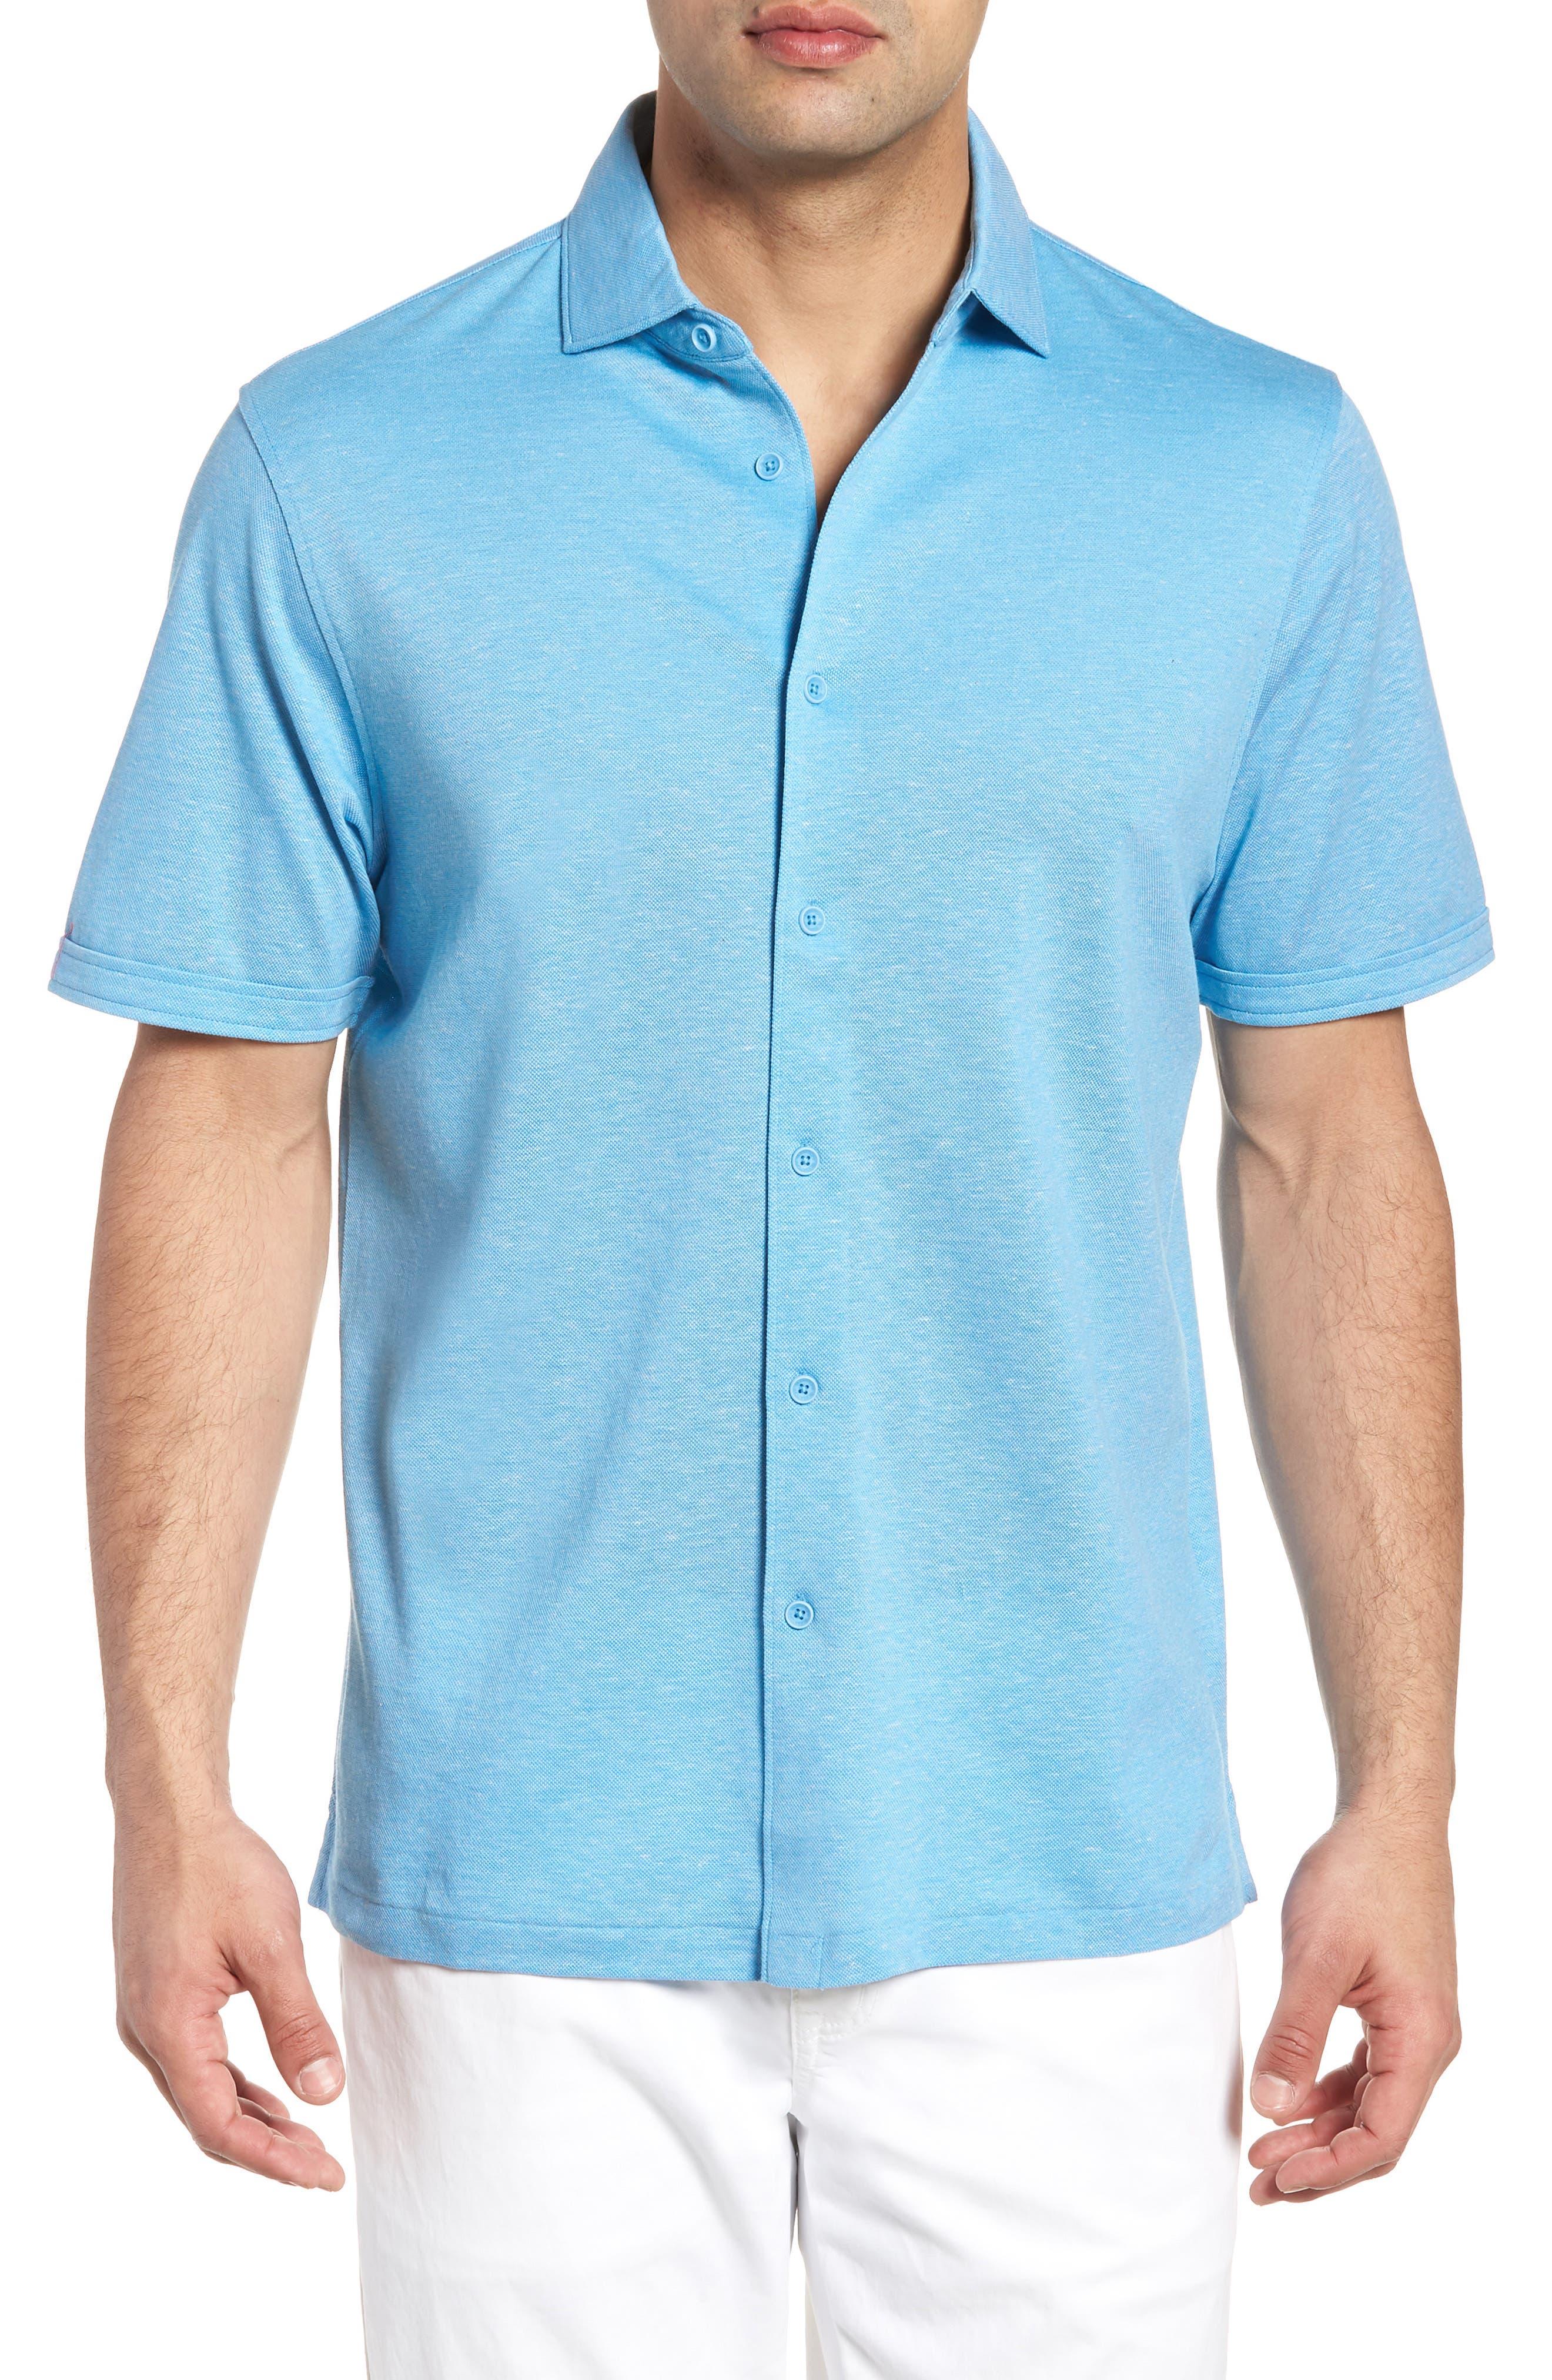 Bugatchi Regular Fit Heather Knit Sport Shirt